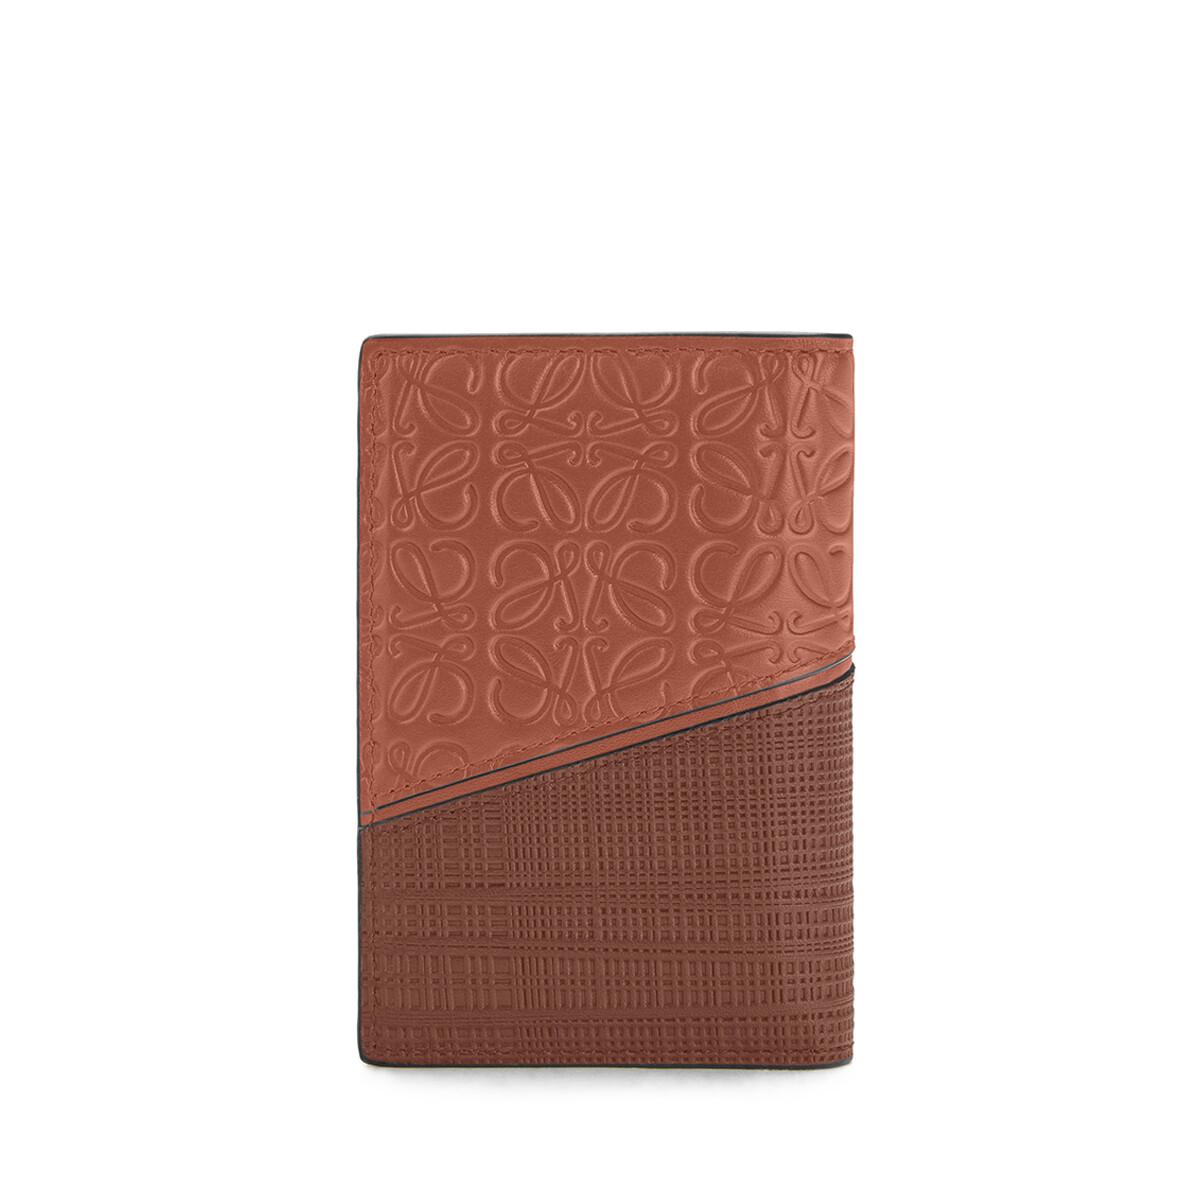 LOEWE Puzzle Bifold Card Cognac front